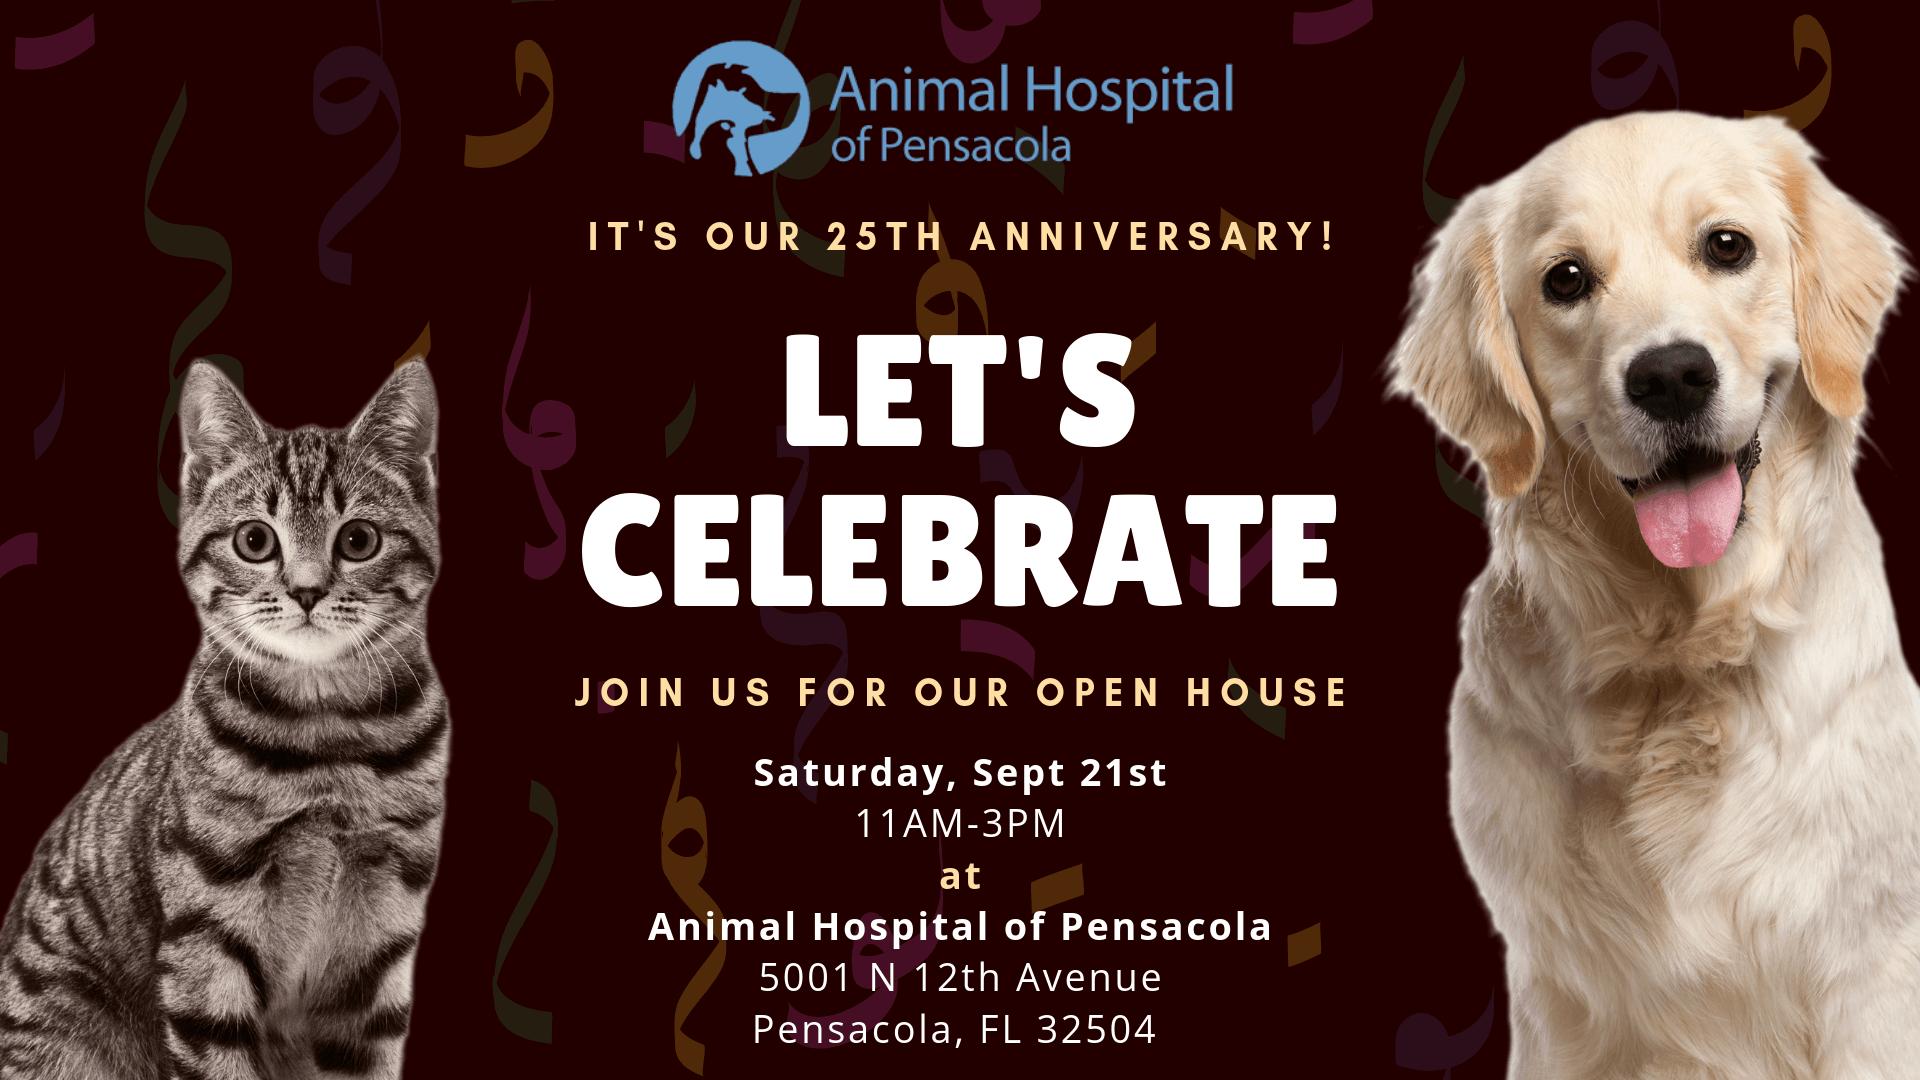 Animal Hospital of Pensacola - Veterinarian in Avenue